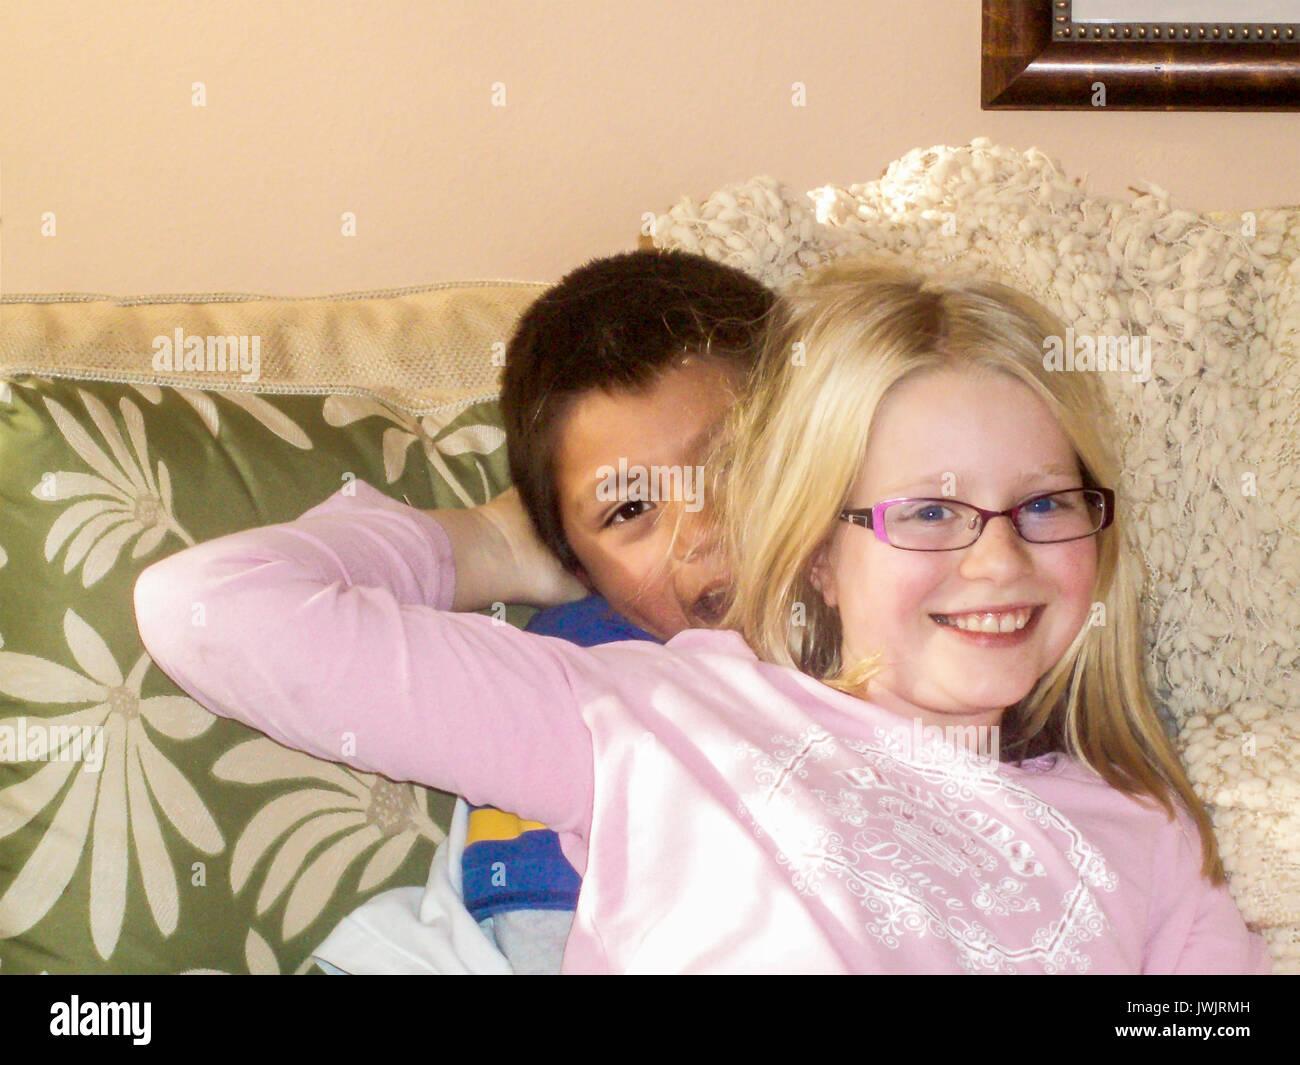 adopted siblings - Stock Image